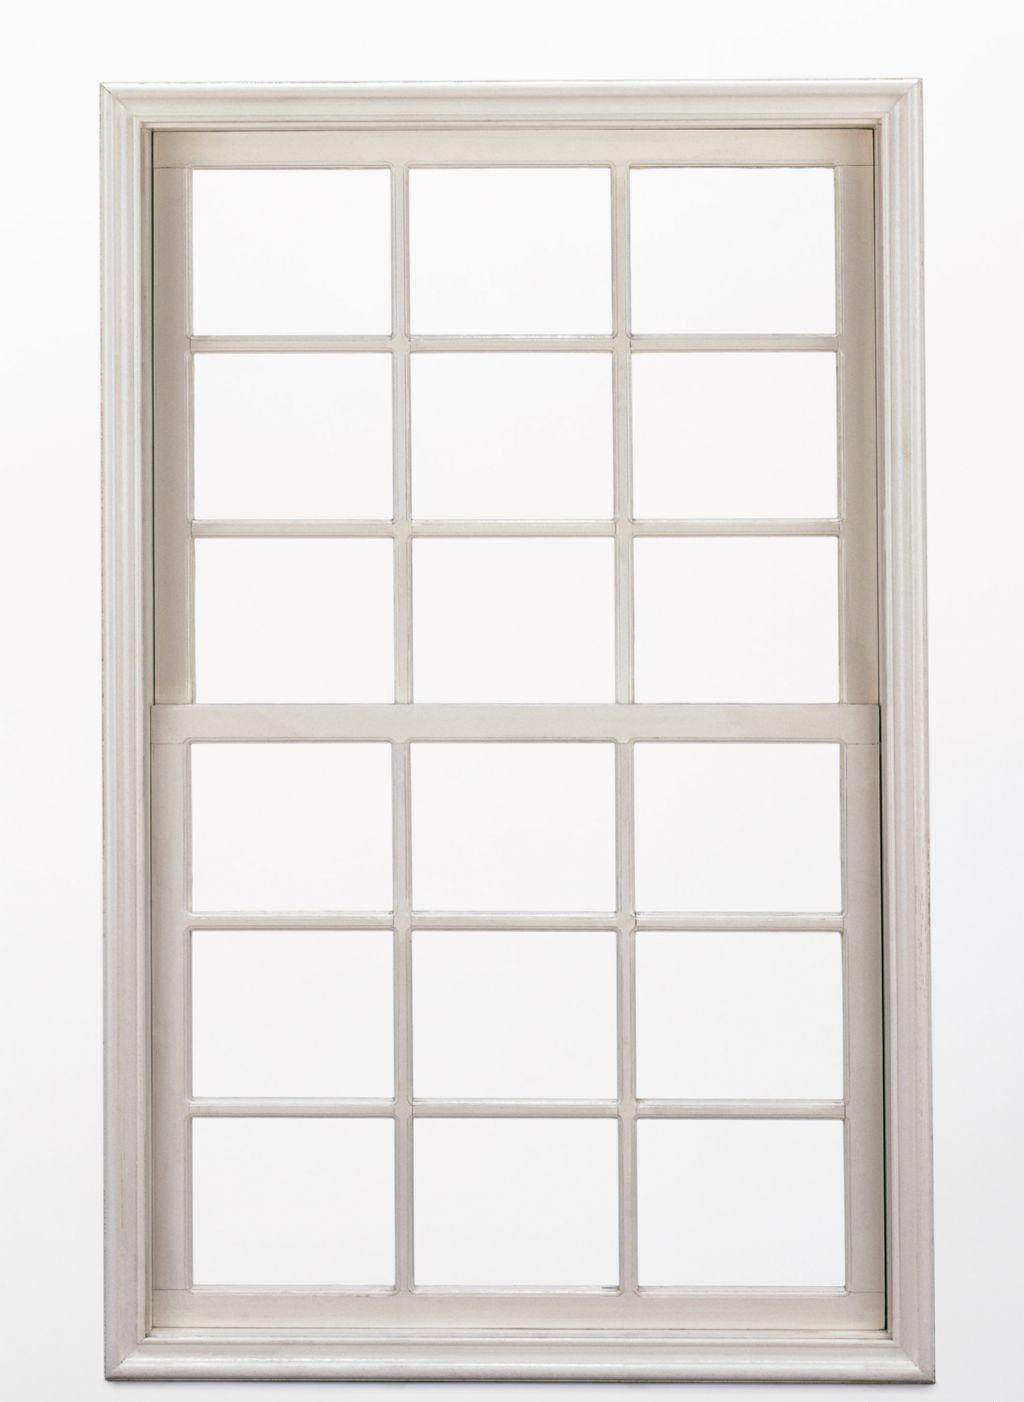 China aluminum vertical sliding single hung window with for Vertical sliding window design